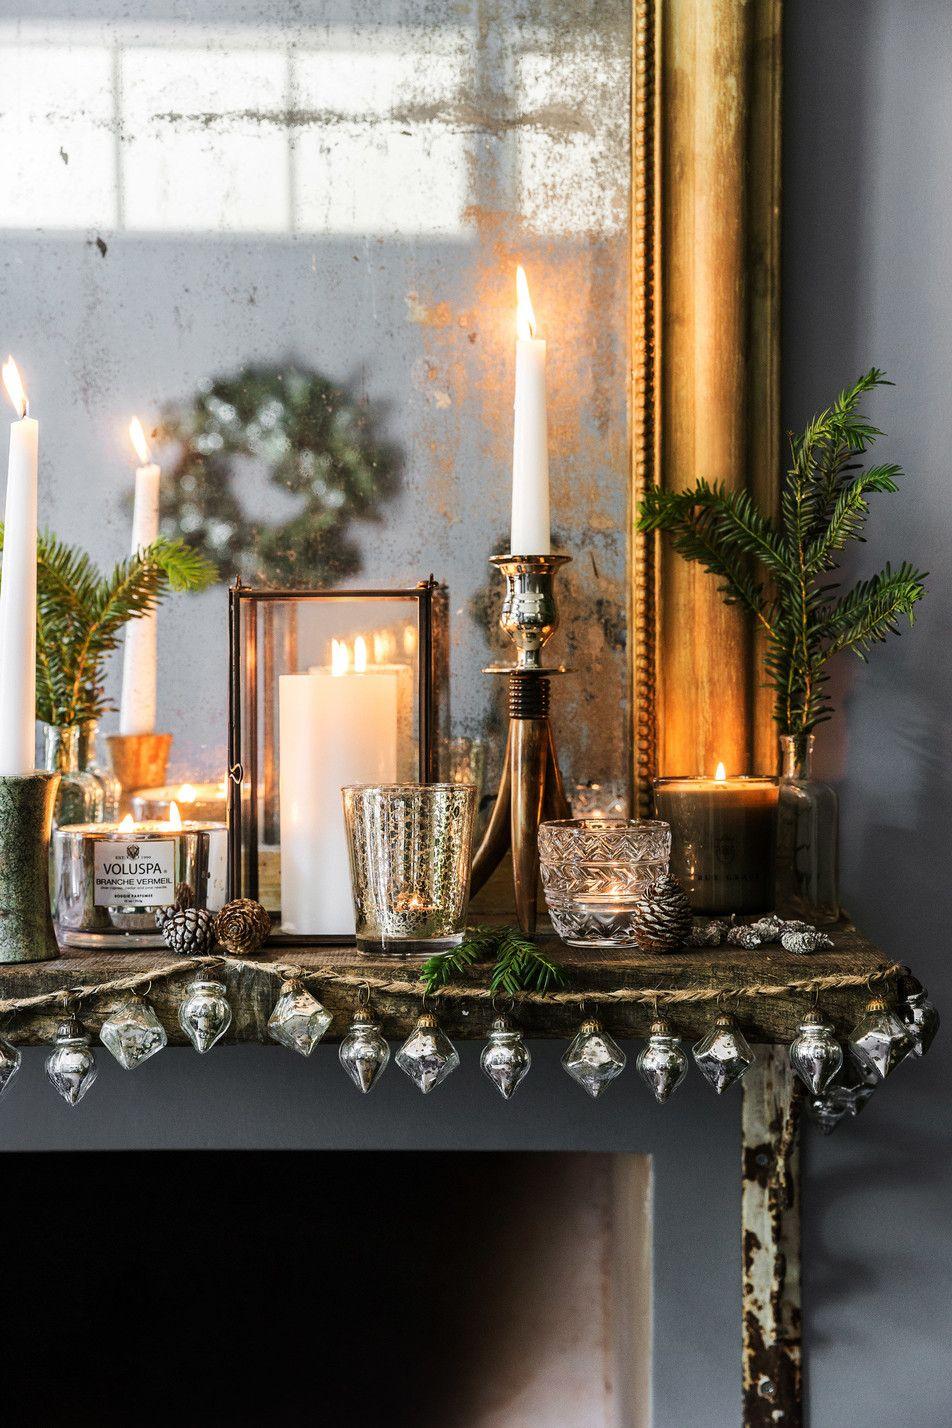 Scandinavian Holiday Decor Musings On Momentum Christmas Fireplace Decor Scandinavian Holiday Decor Christmas Mantel Decorations